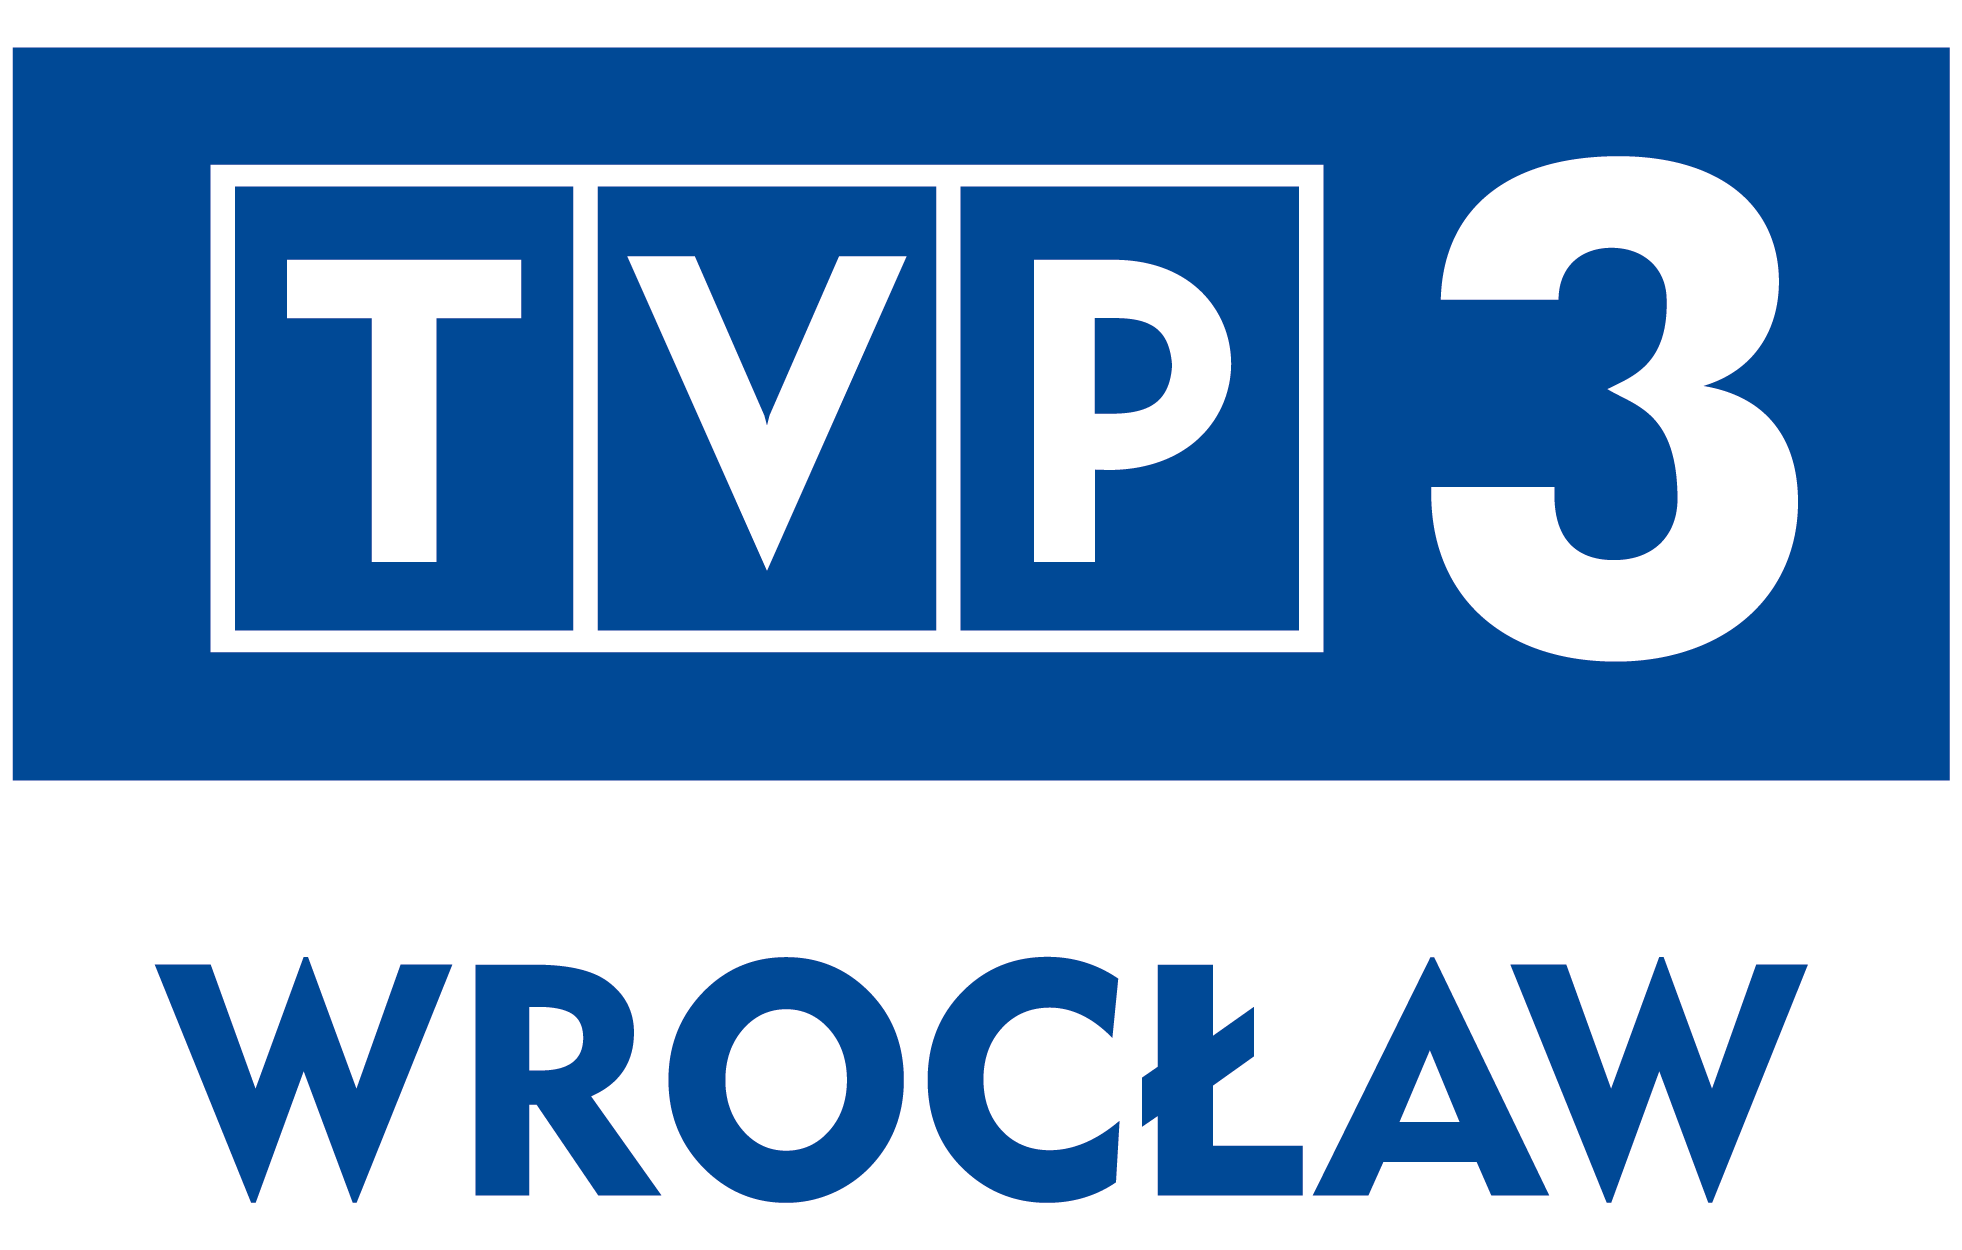 TVP3_Wroclaw_logo